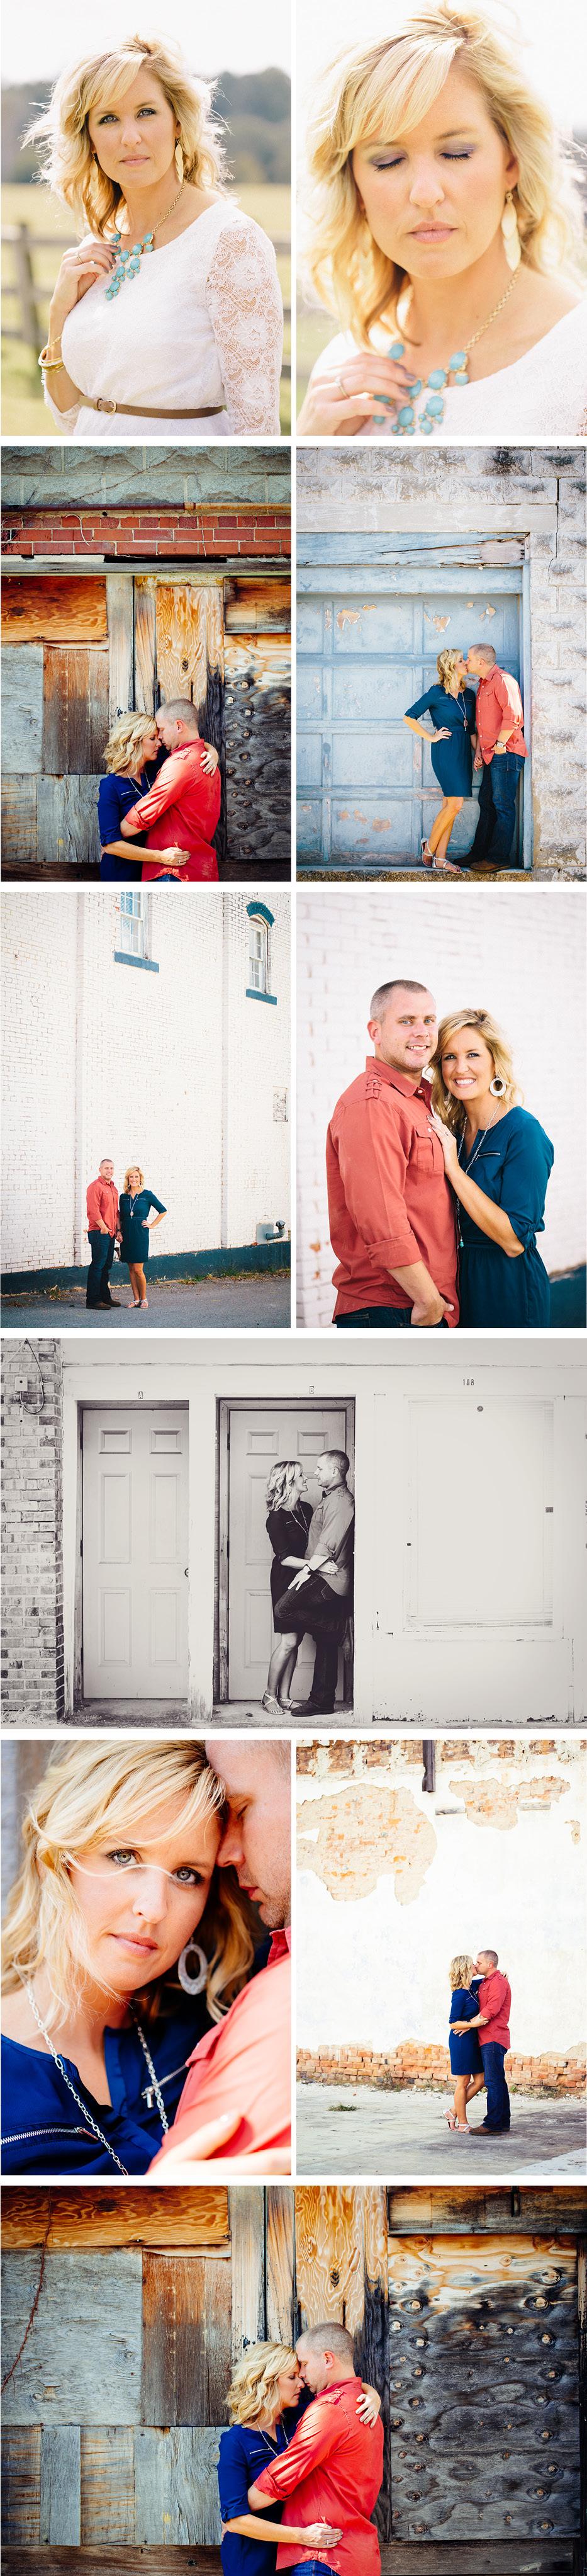 CK-Photo-Nashville-Engagement-Photographer-Crosby2.jpg